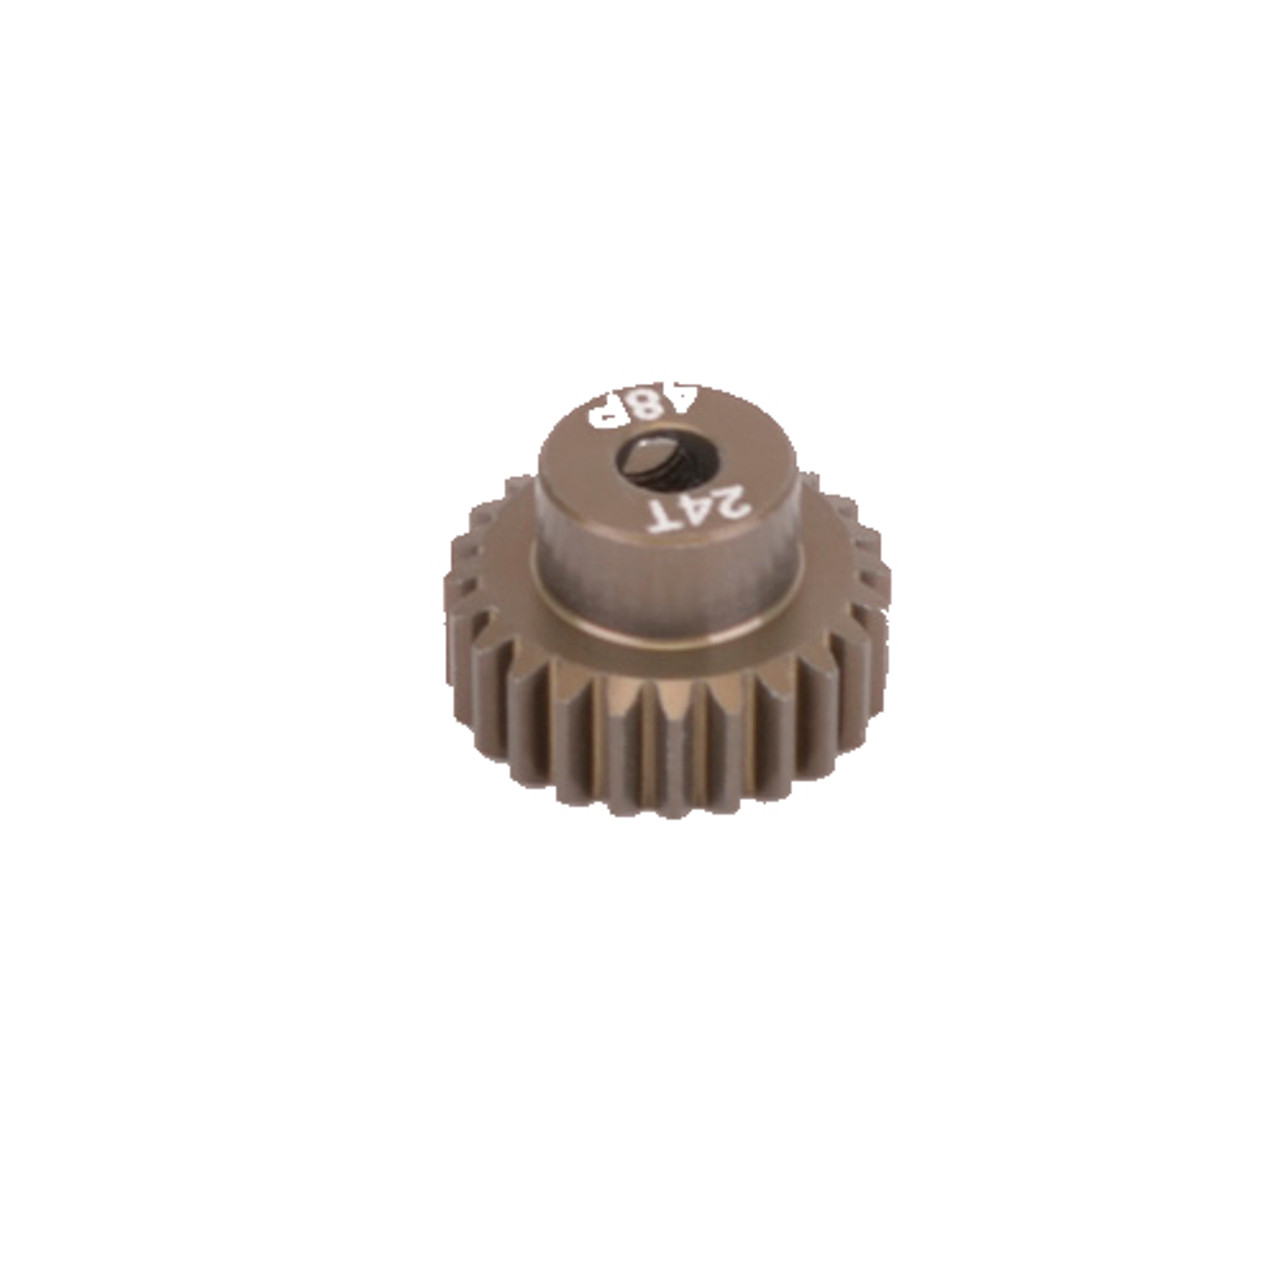 7075 Hard CR4824 Core RC Pinion Gear 48DP 24T